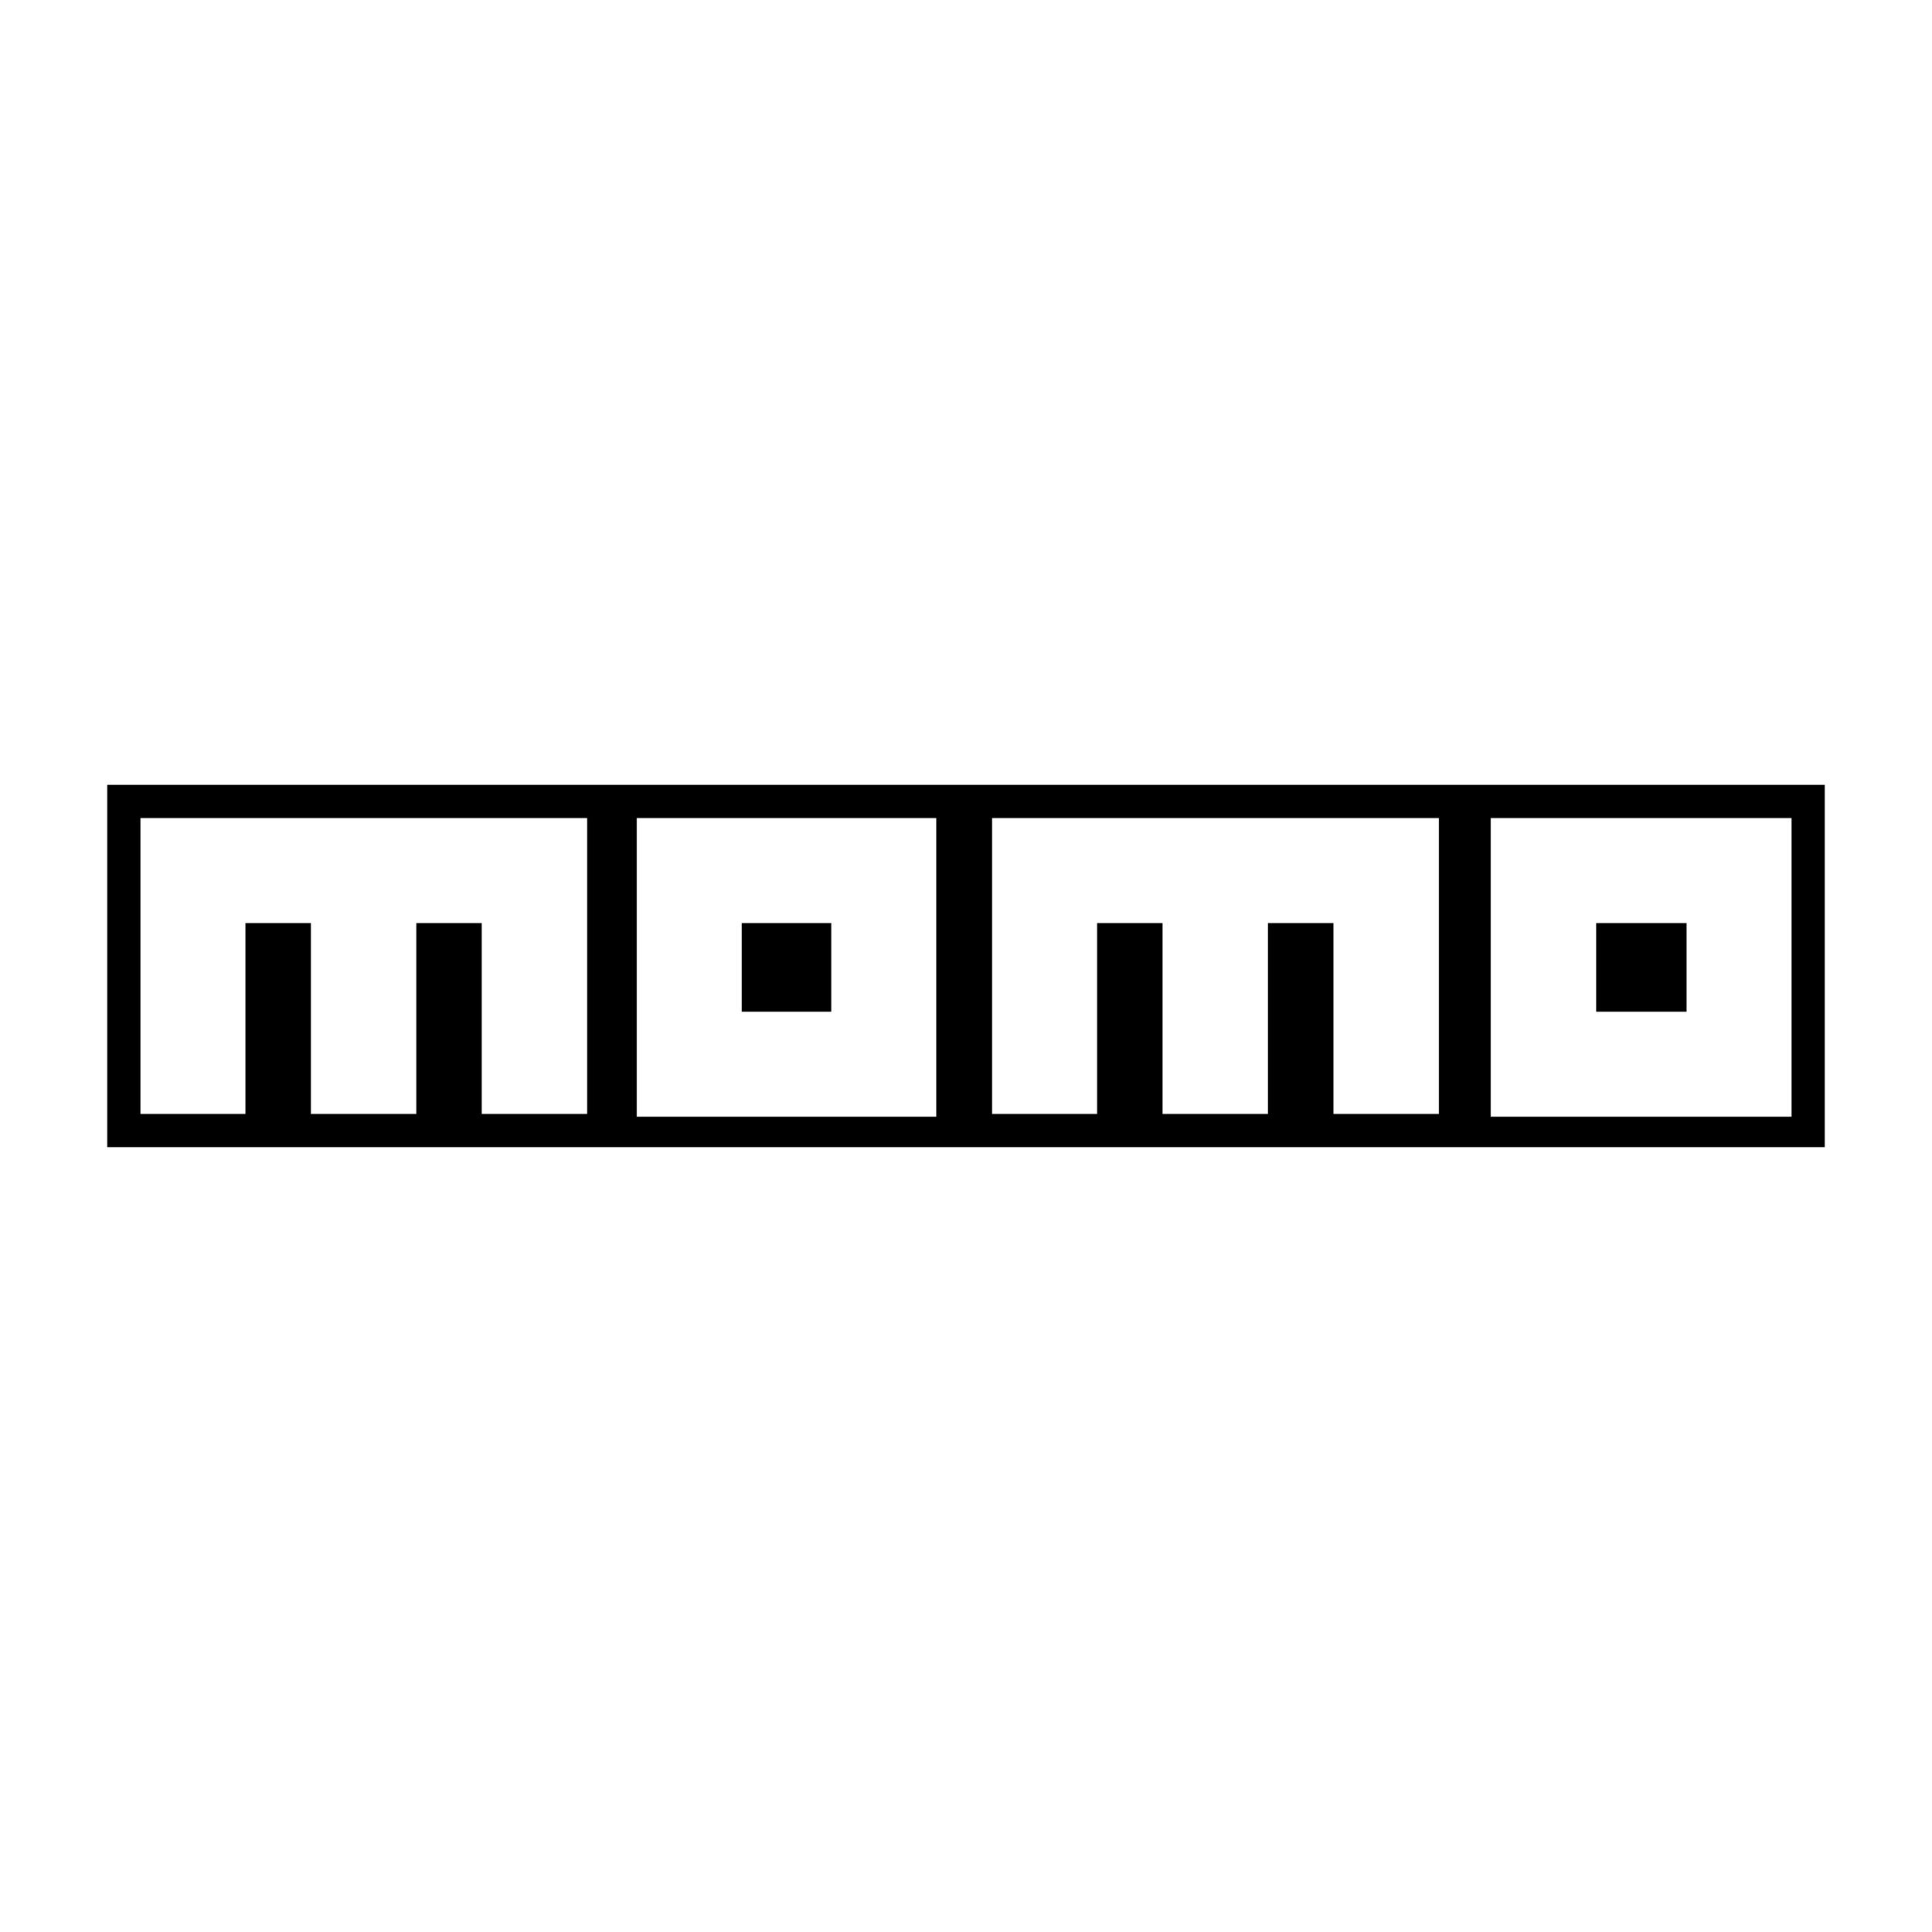 sticker momo ref 2 tuning audio sonorisation car auto moto camion competition deco rallye autocollant